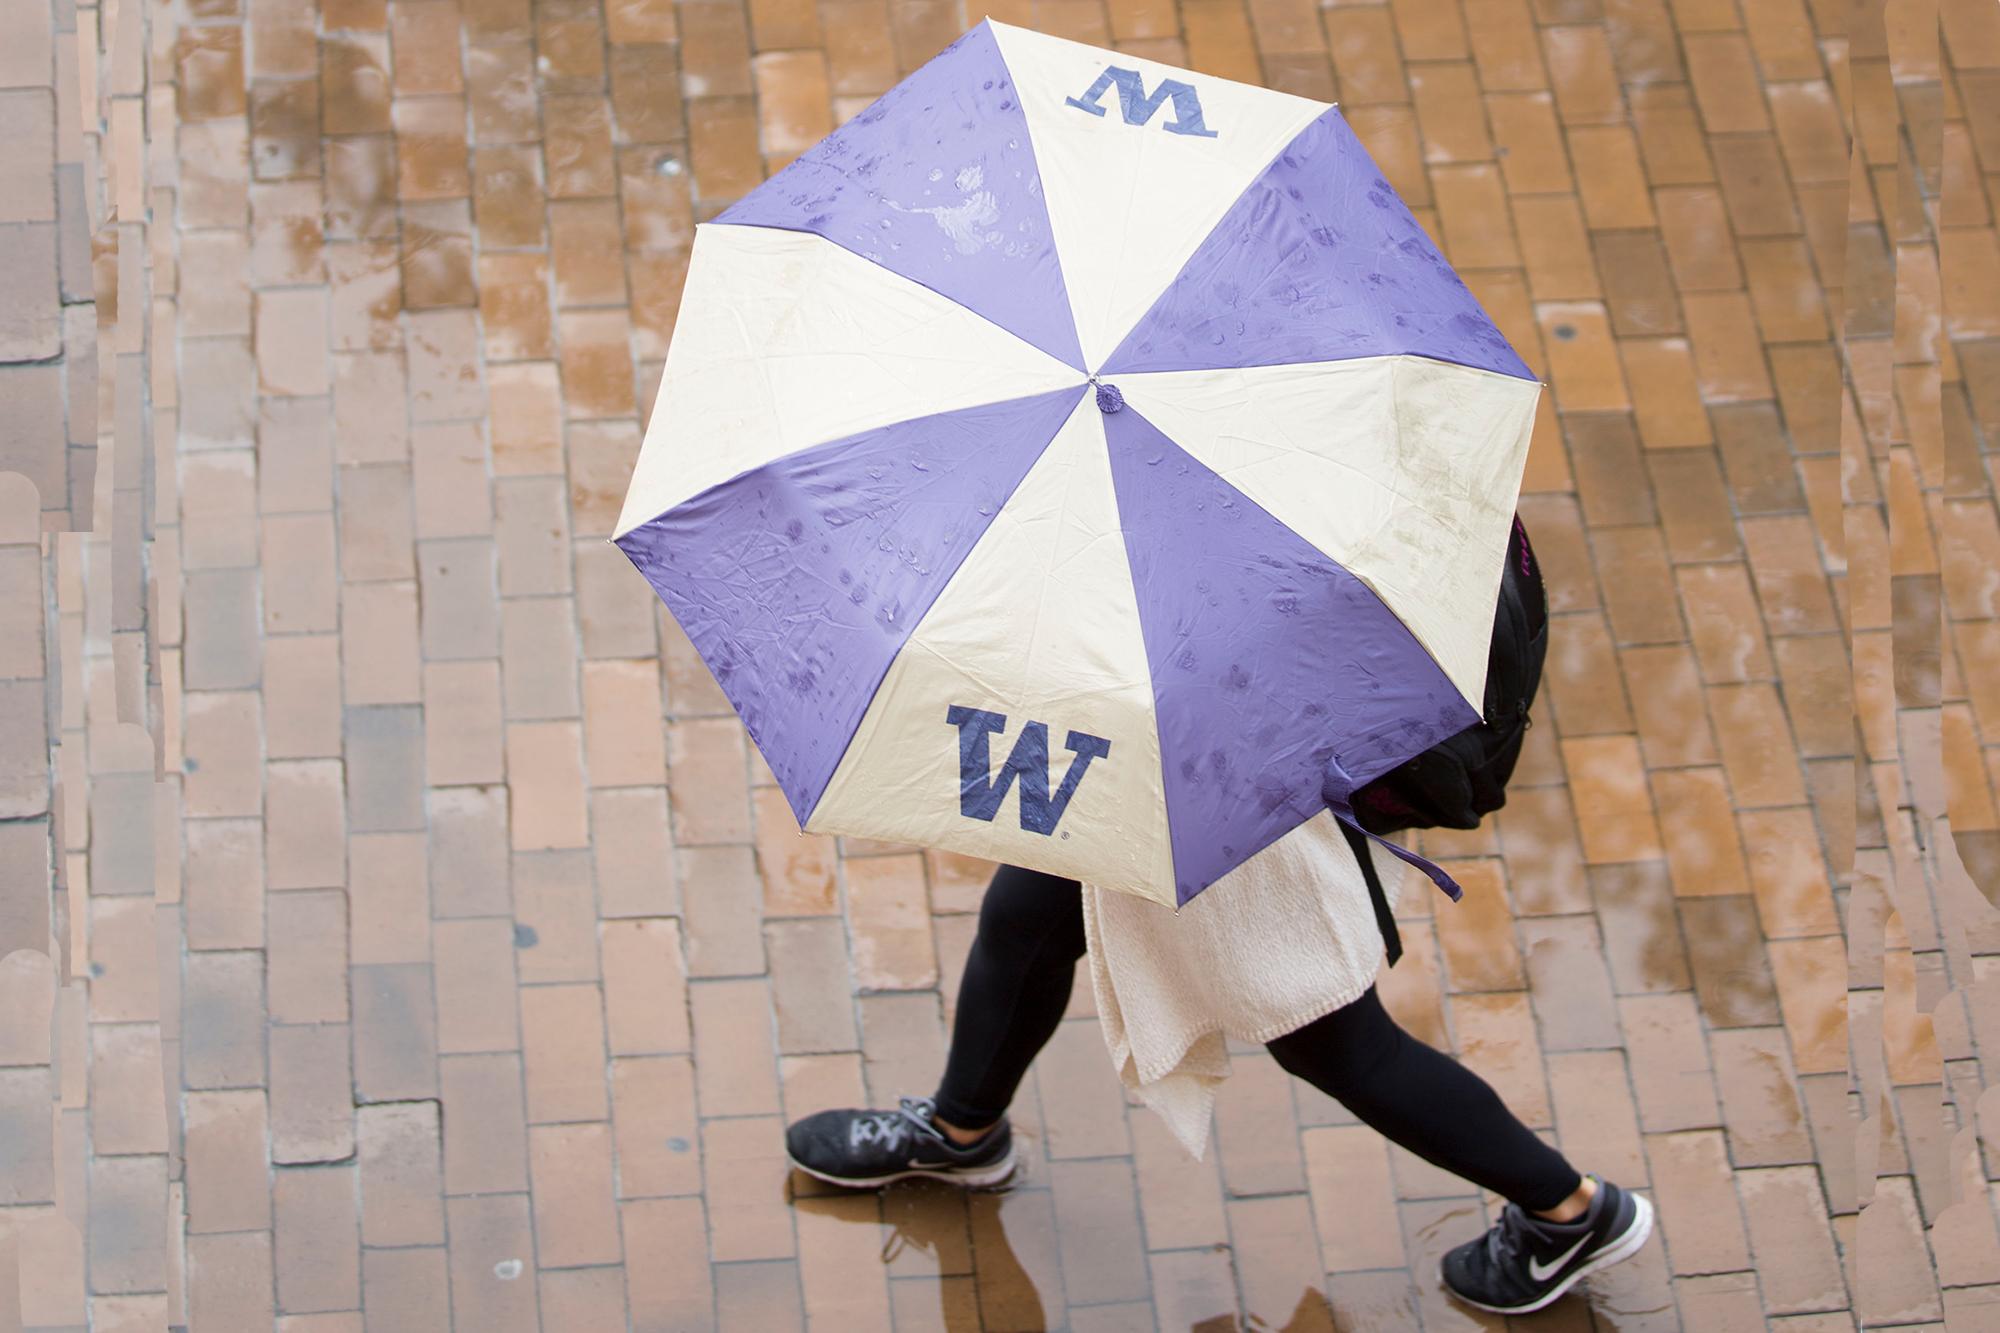 Student walking with UW umbrella